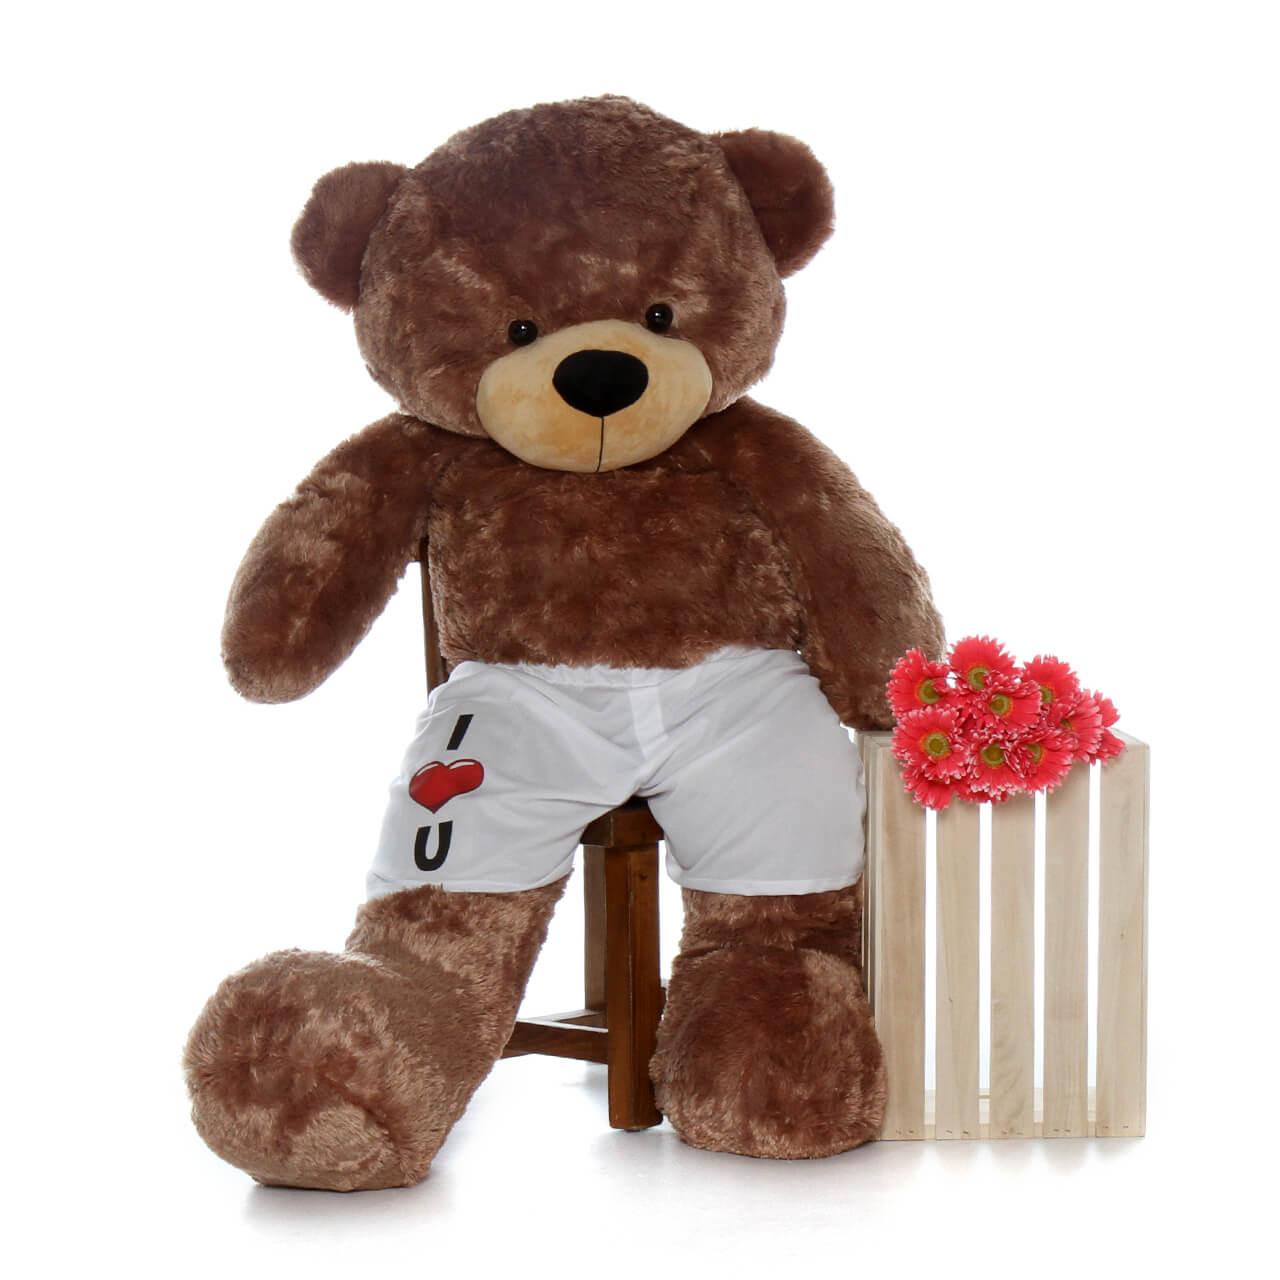 Mocha Brown Giant Teddy Brand Huge Bear with Pants! 5 Foot Bear